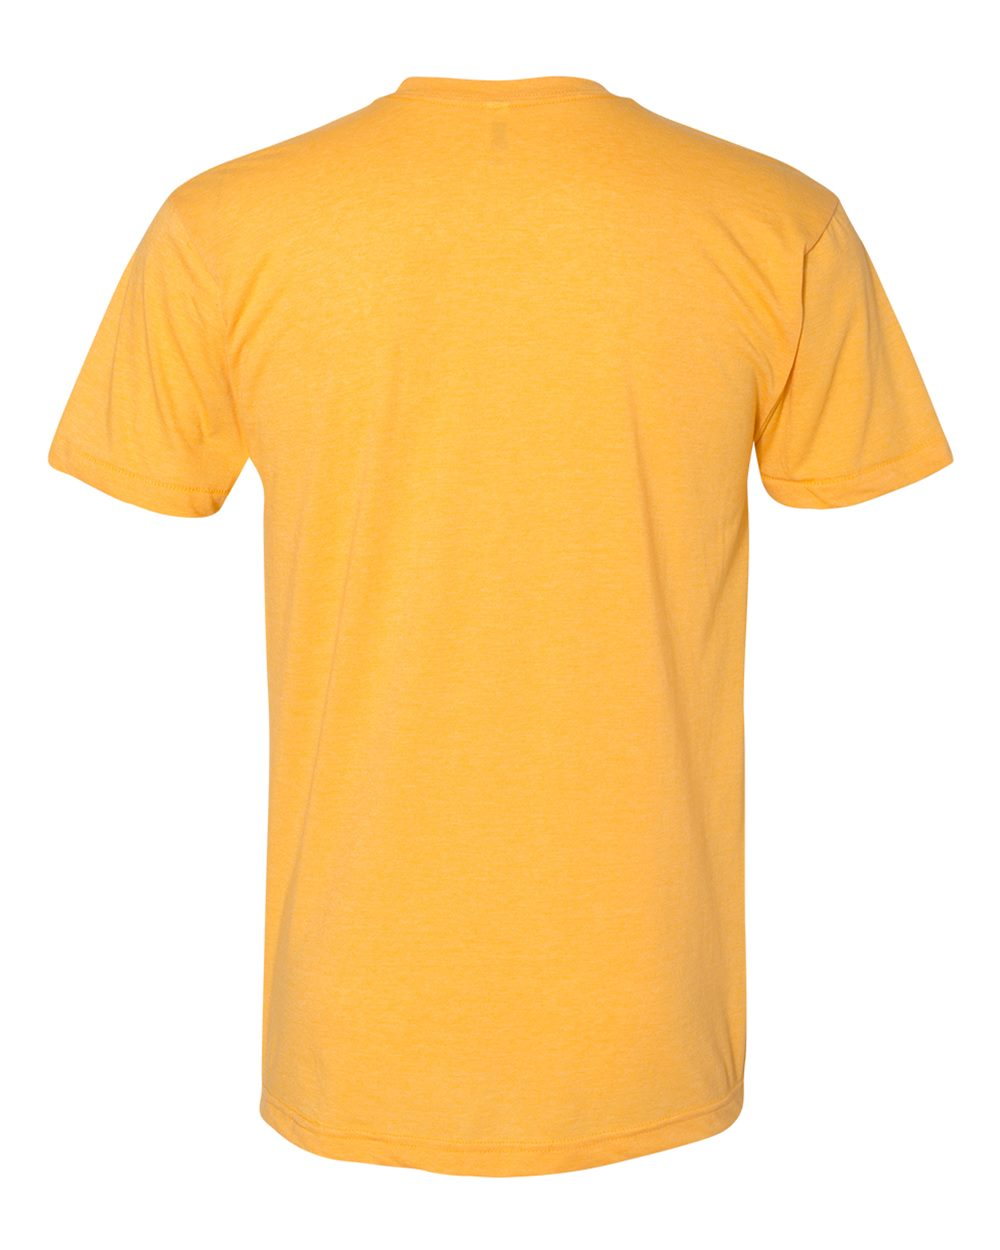 American-Apparel-Mens-Slim-Fit-50-50-Cotton-T-Shirt-Tee-BB401W-up-to-2XL thumbnail 22